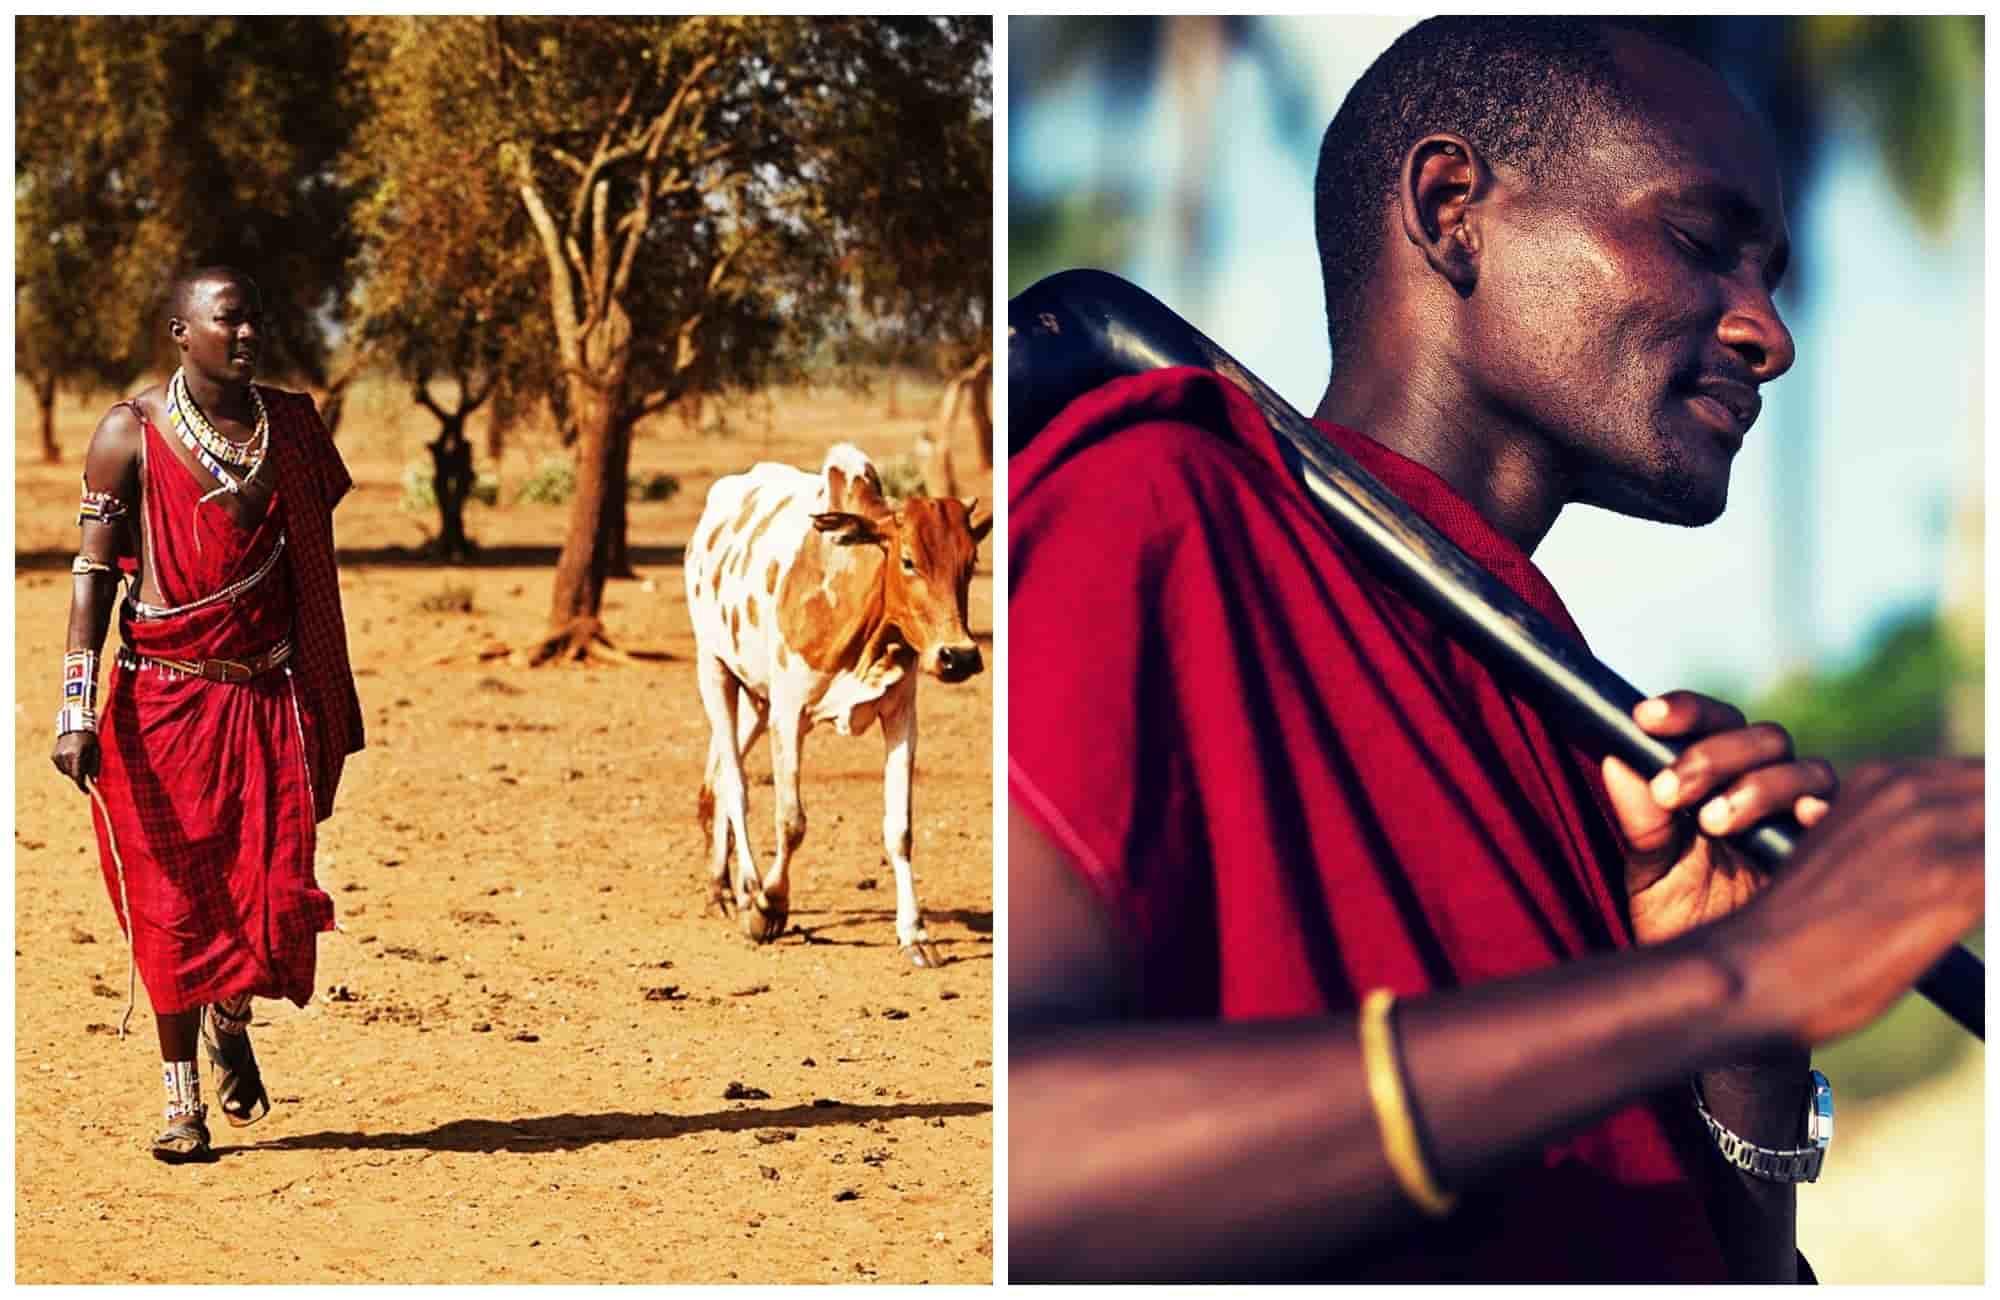 Voyage en Tanzanie - Portraits de Massaï - Amplitudes